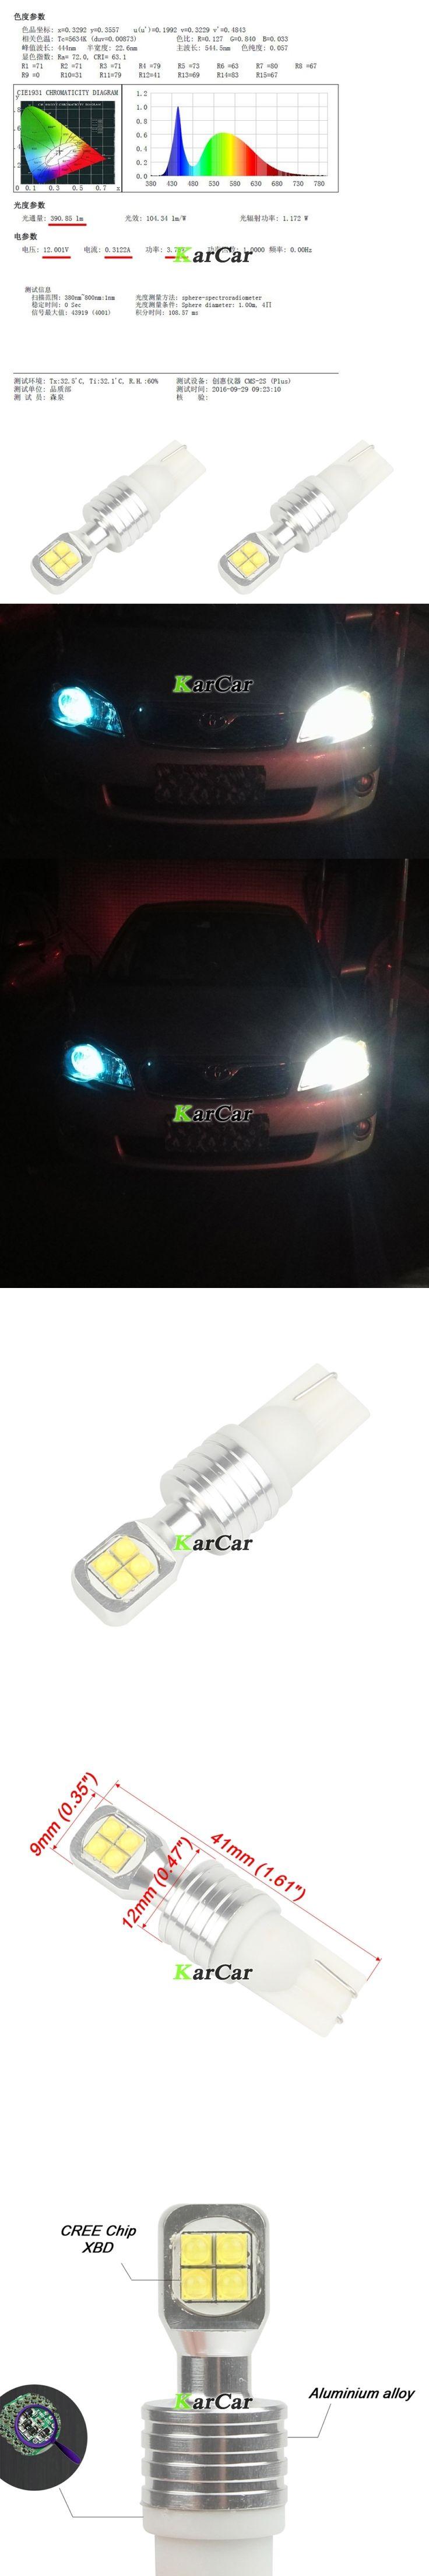 2x New 40W CREE Chip XBD 390LM T10 194 W5W LED Reverse Bulb 912 Clearance Light 161 Tail Lamp, 12V 168 Brake Light 921 Stop Blub